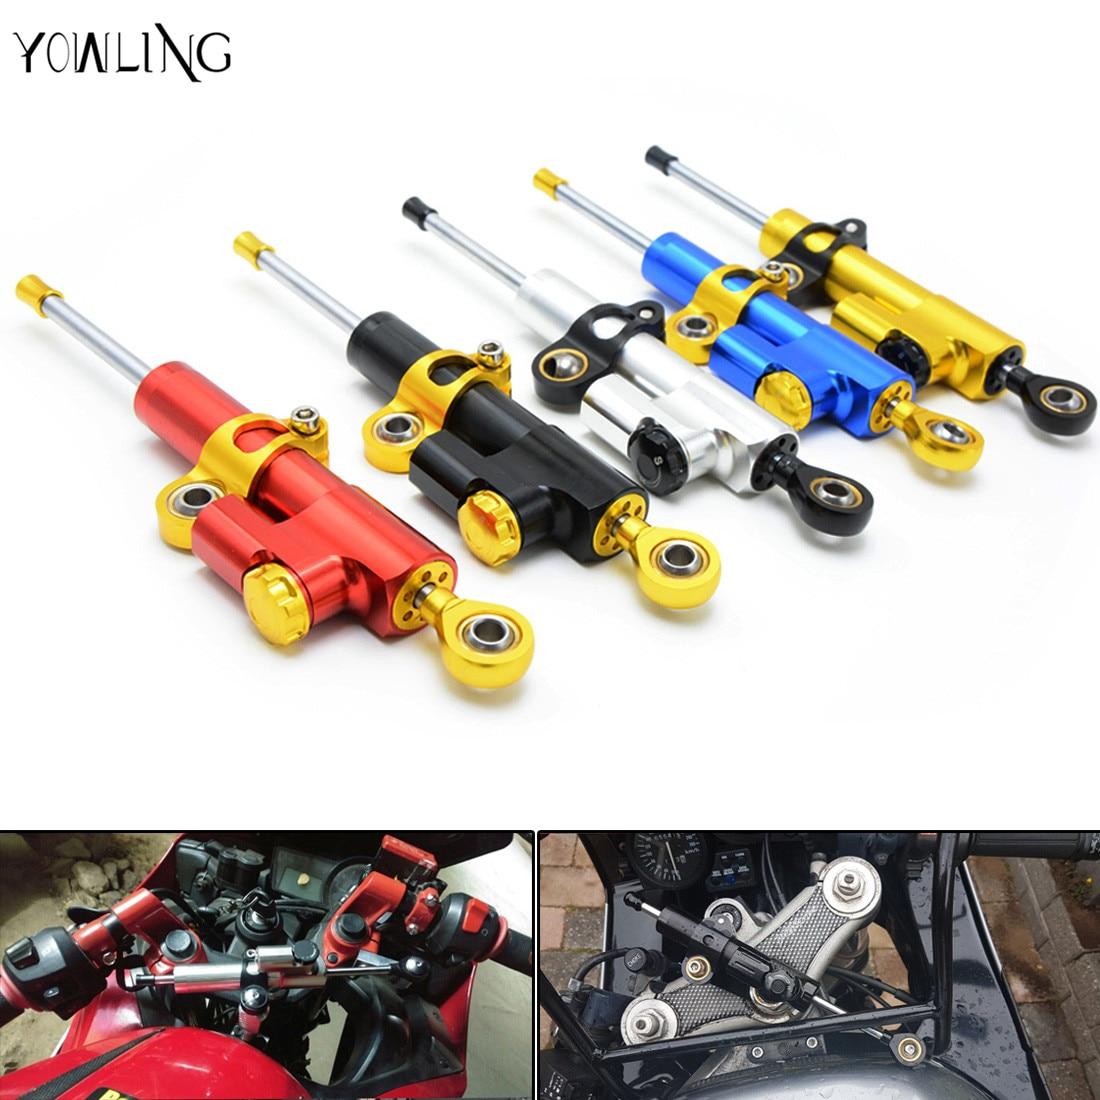 Universal Motorcycle CNC Steering Damper For Kawasaki yamaha honda CB 599 919 400 CB600 HORNET CBR 600 F2 F3 F4 F4i 900RR 250<br>